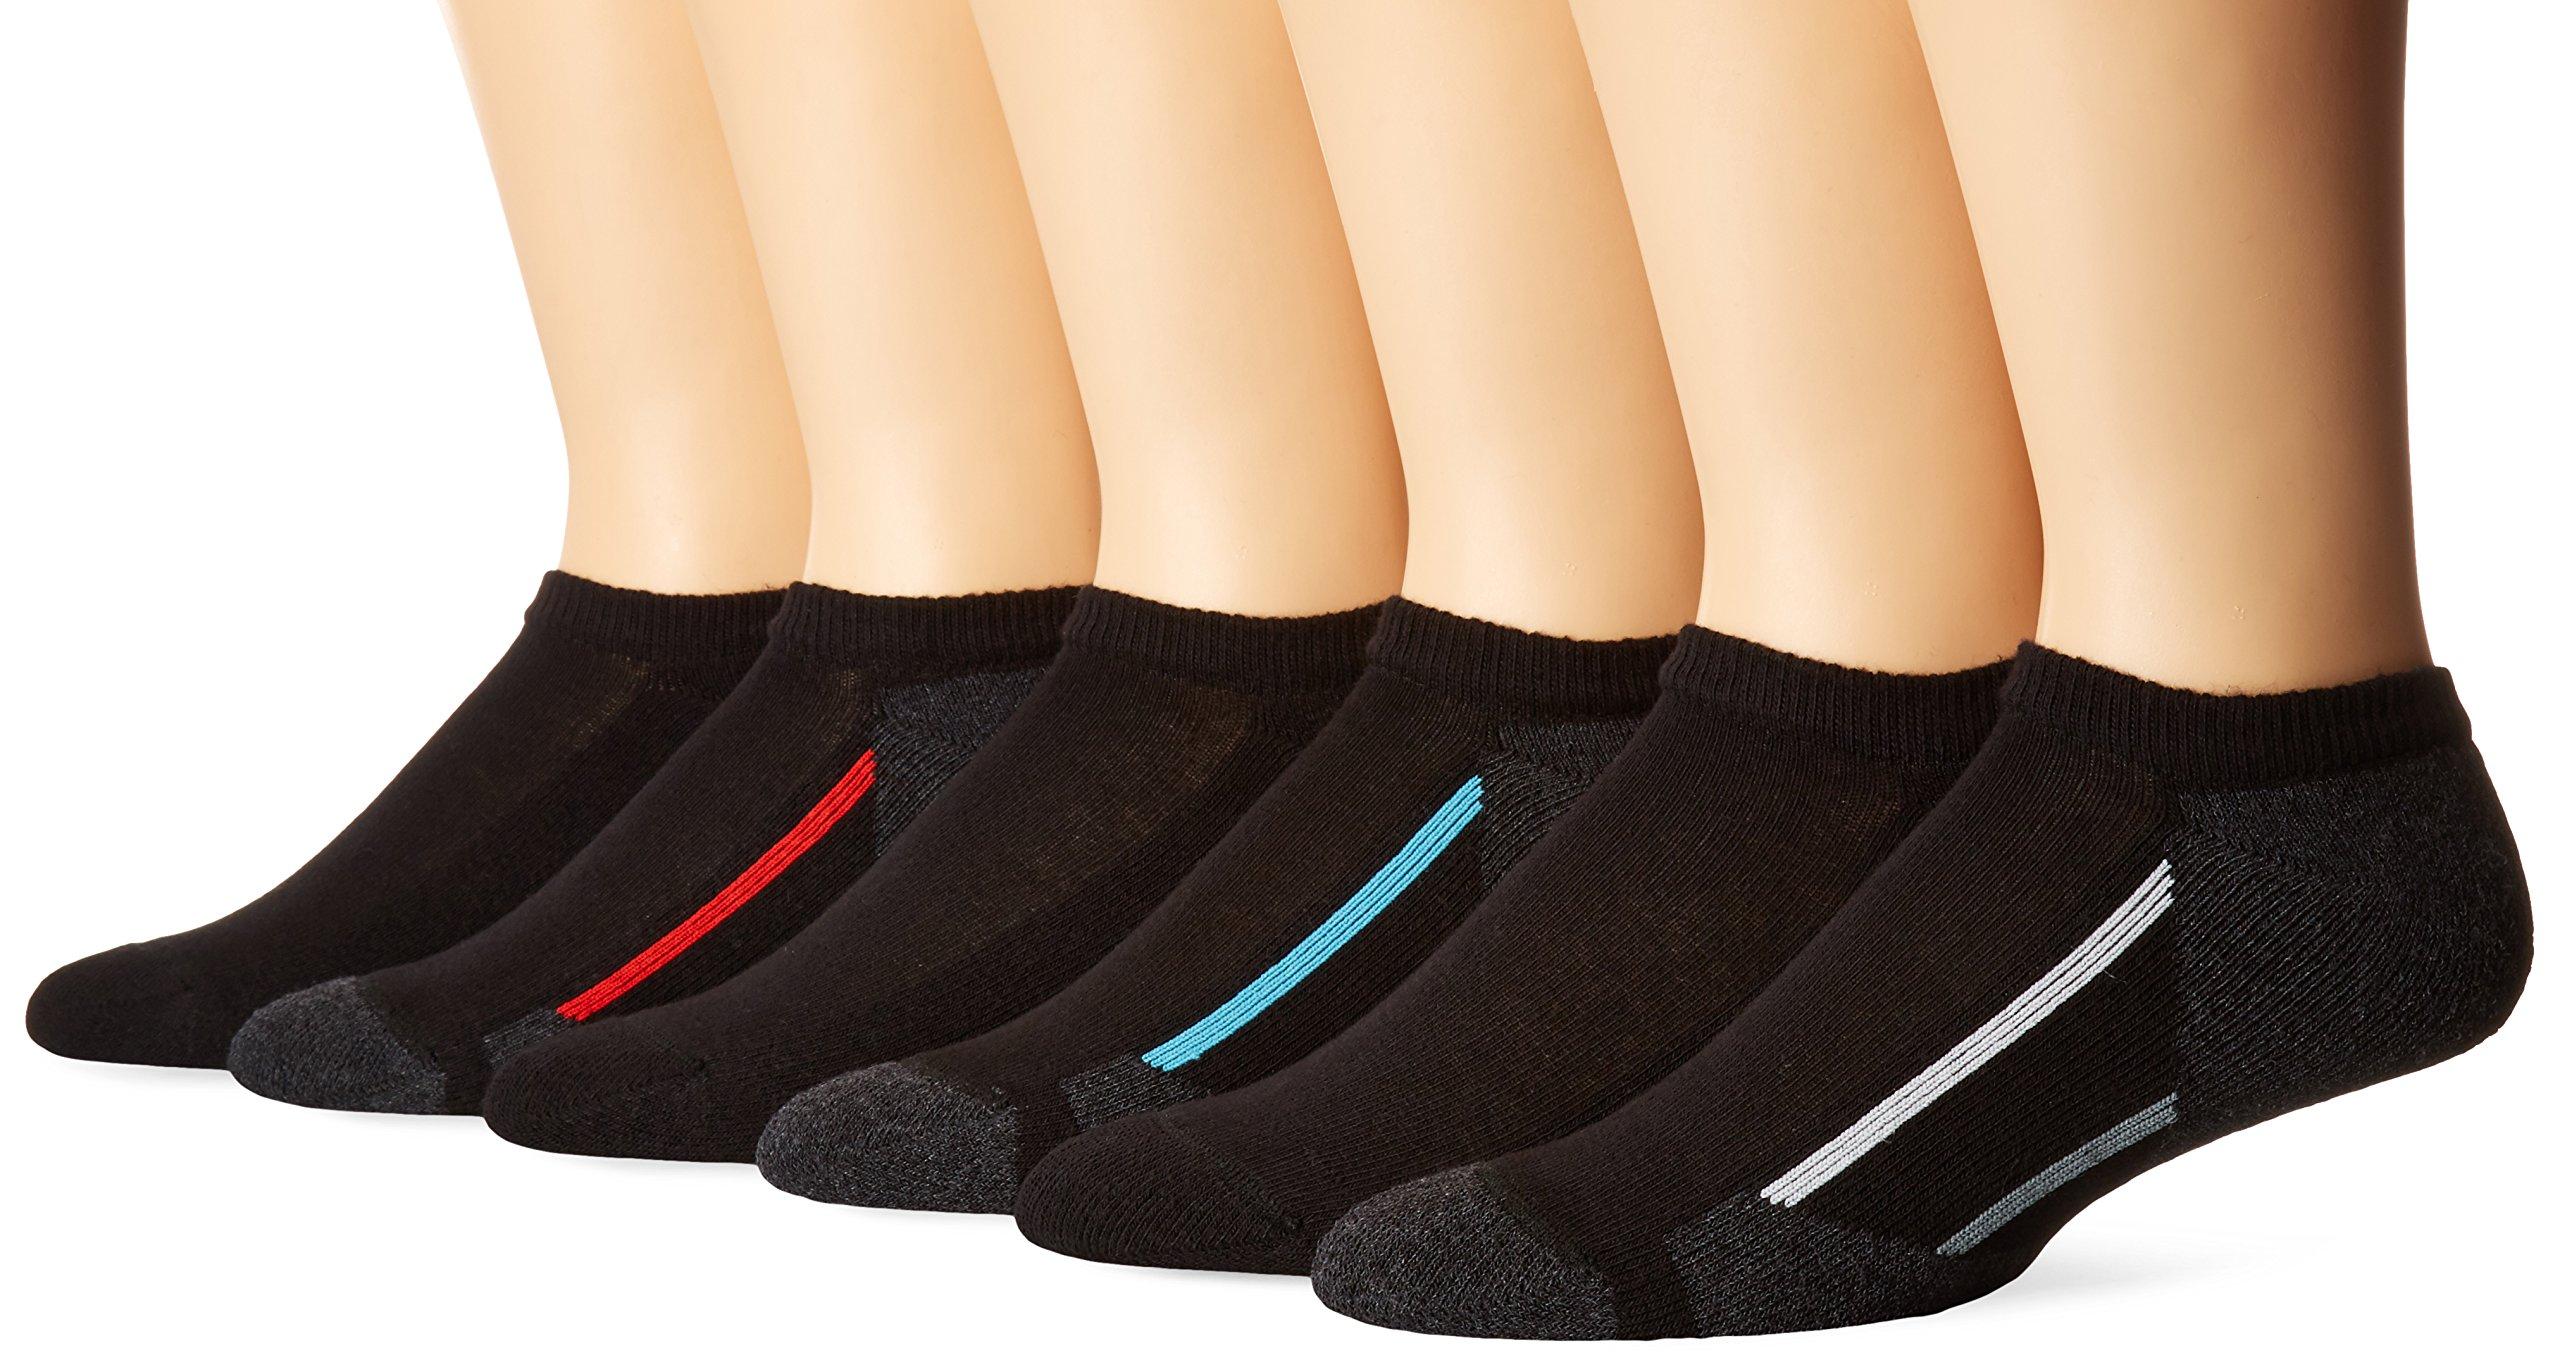 Hanes Big Boys' 12-Pack No Show Socks,Black,Large(3-9)